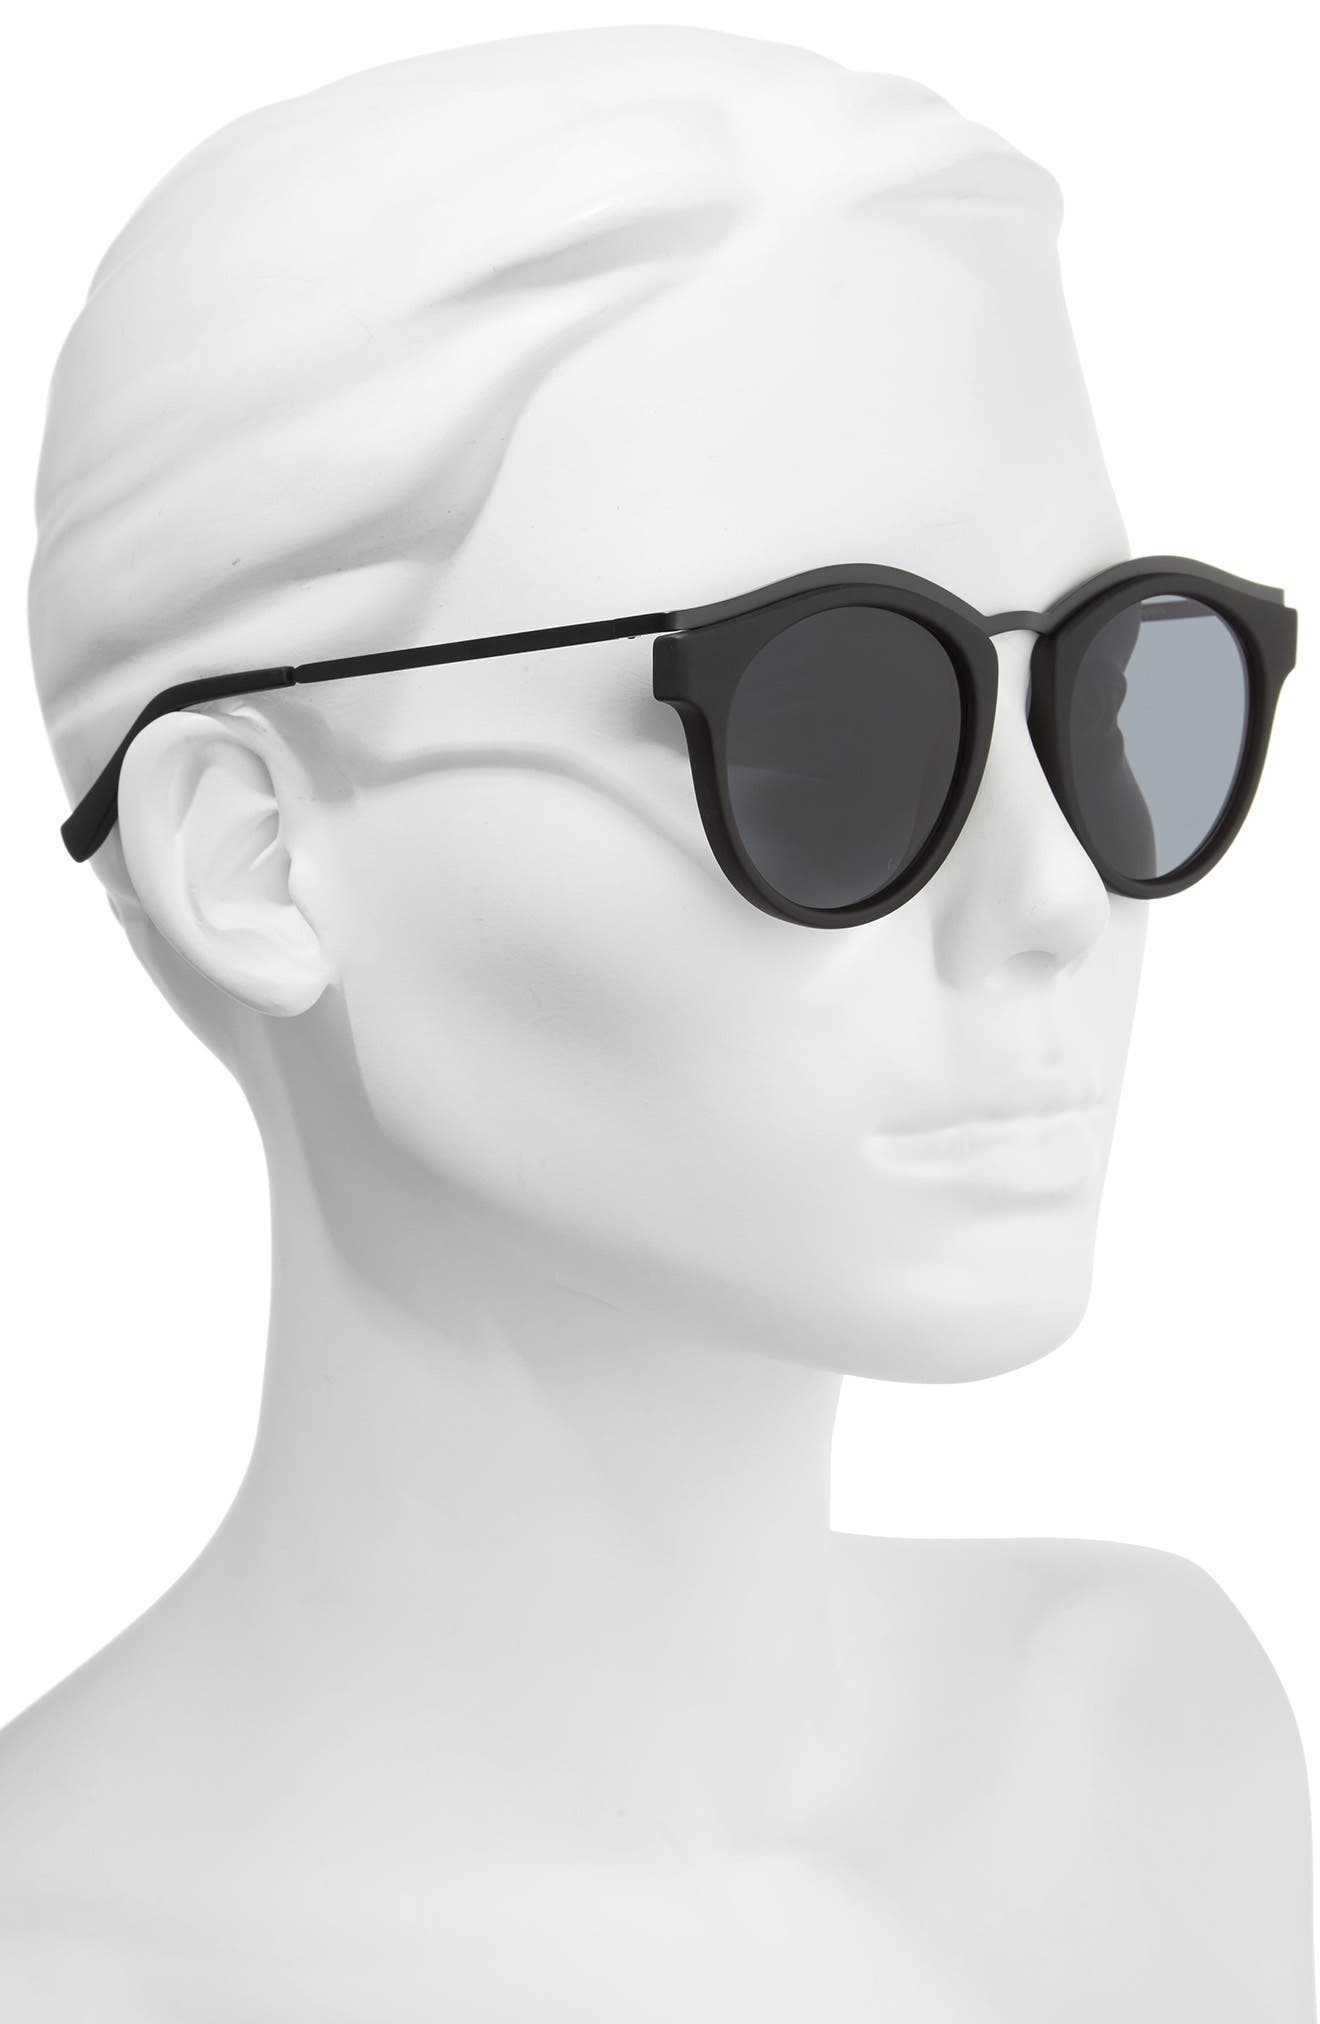 Hypnotize 50mm Round Sunglasses,                             Alternate thumbnail 2, color,                             Black Rubber